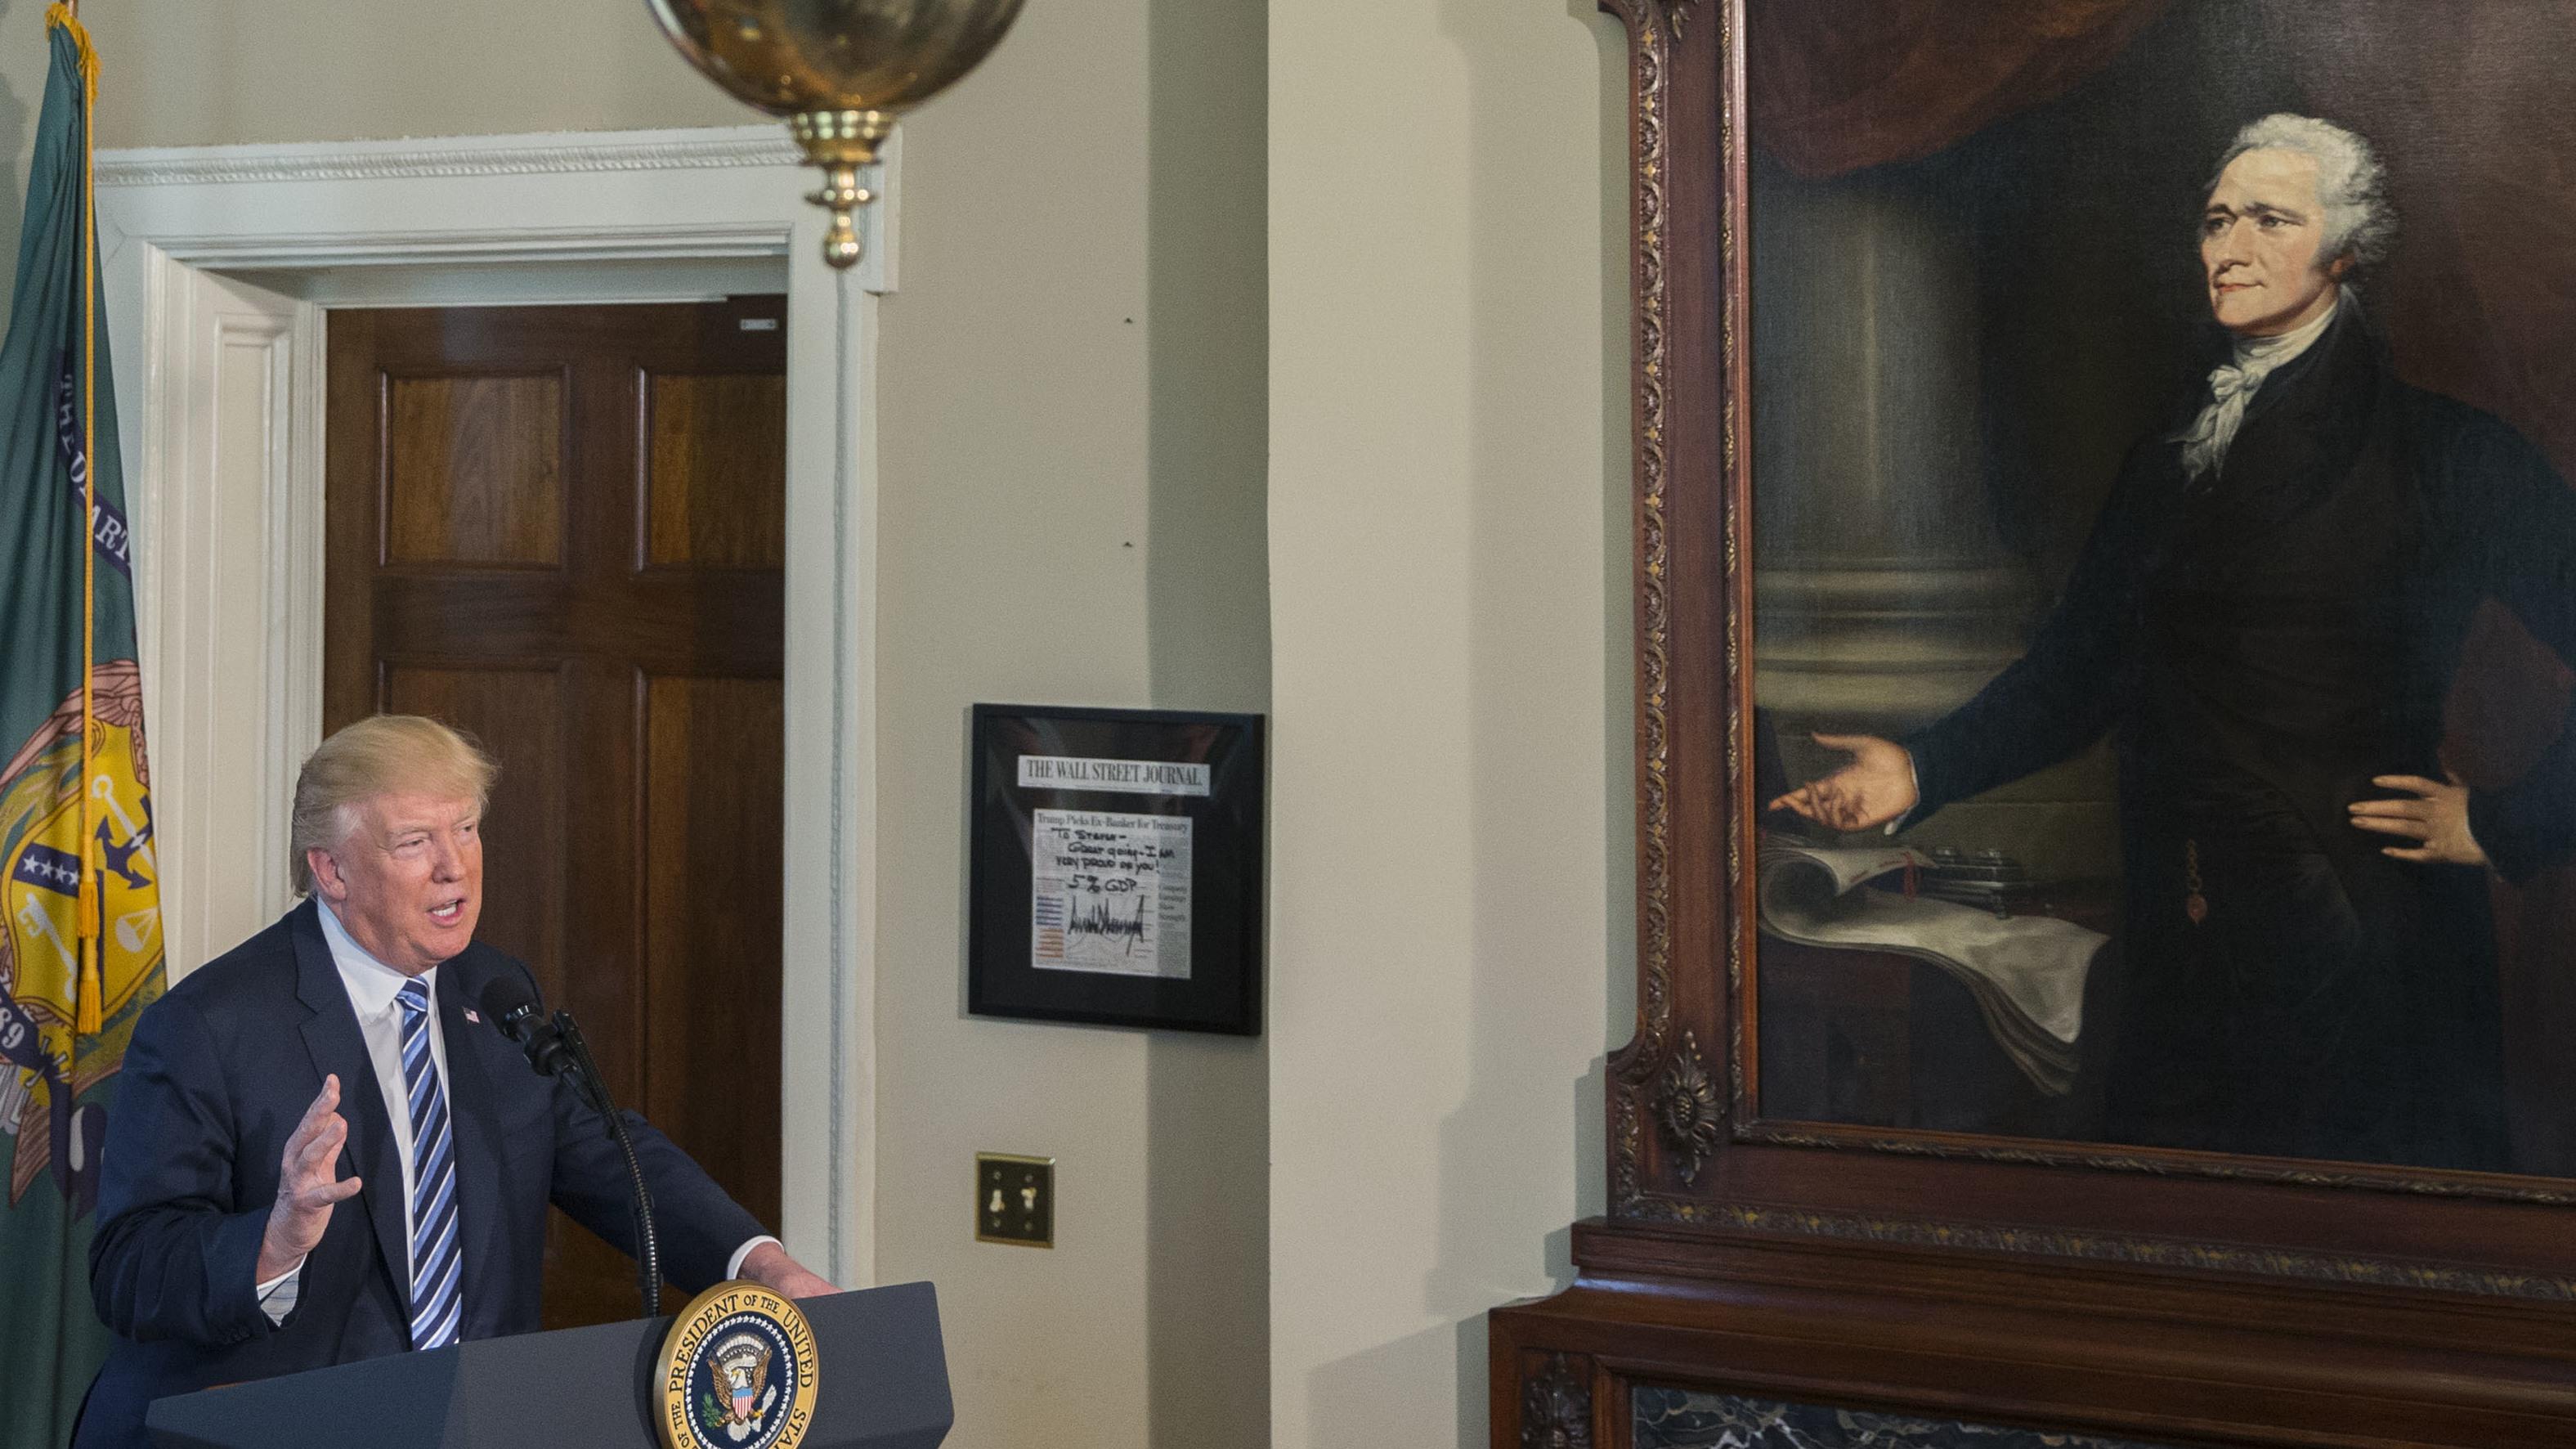 npr.org - Domenico Montanaro - Trump's First 100 Days: An 'Entry-Level' Presidency